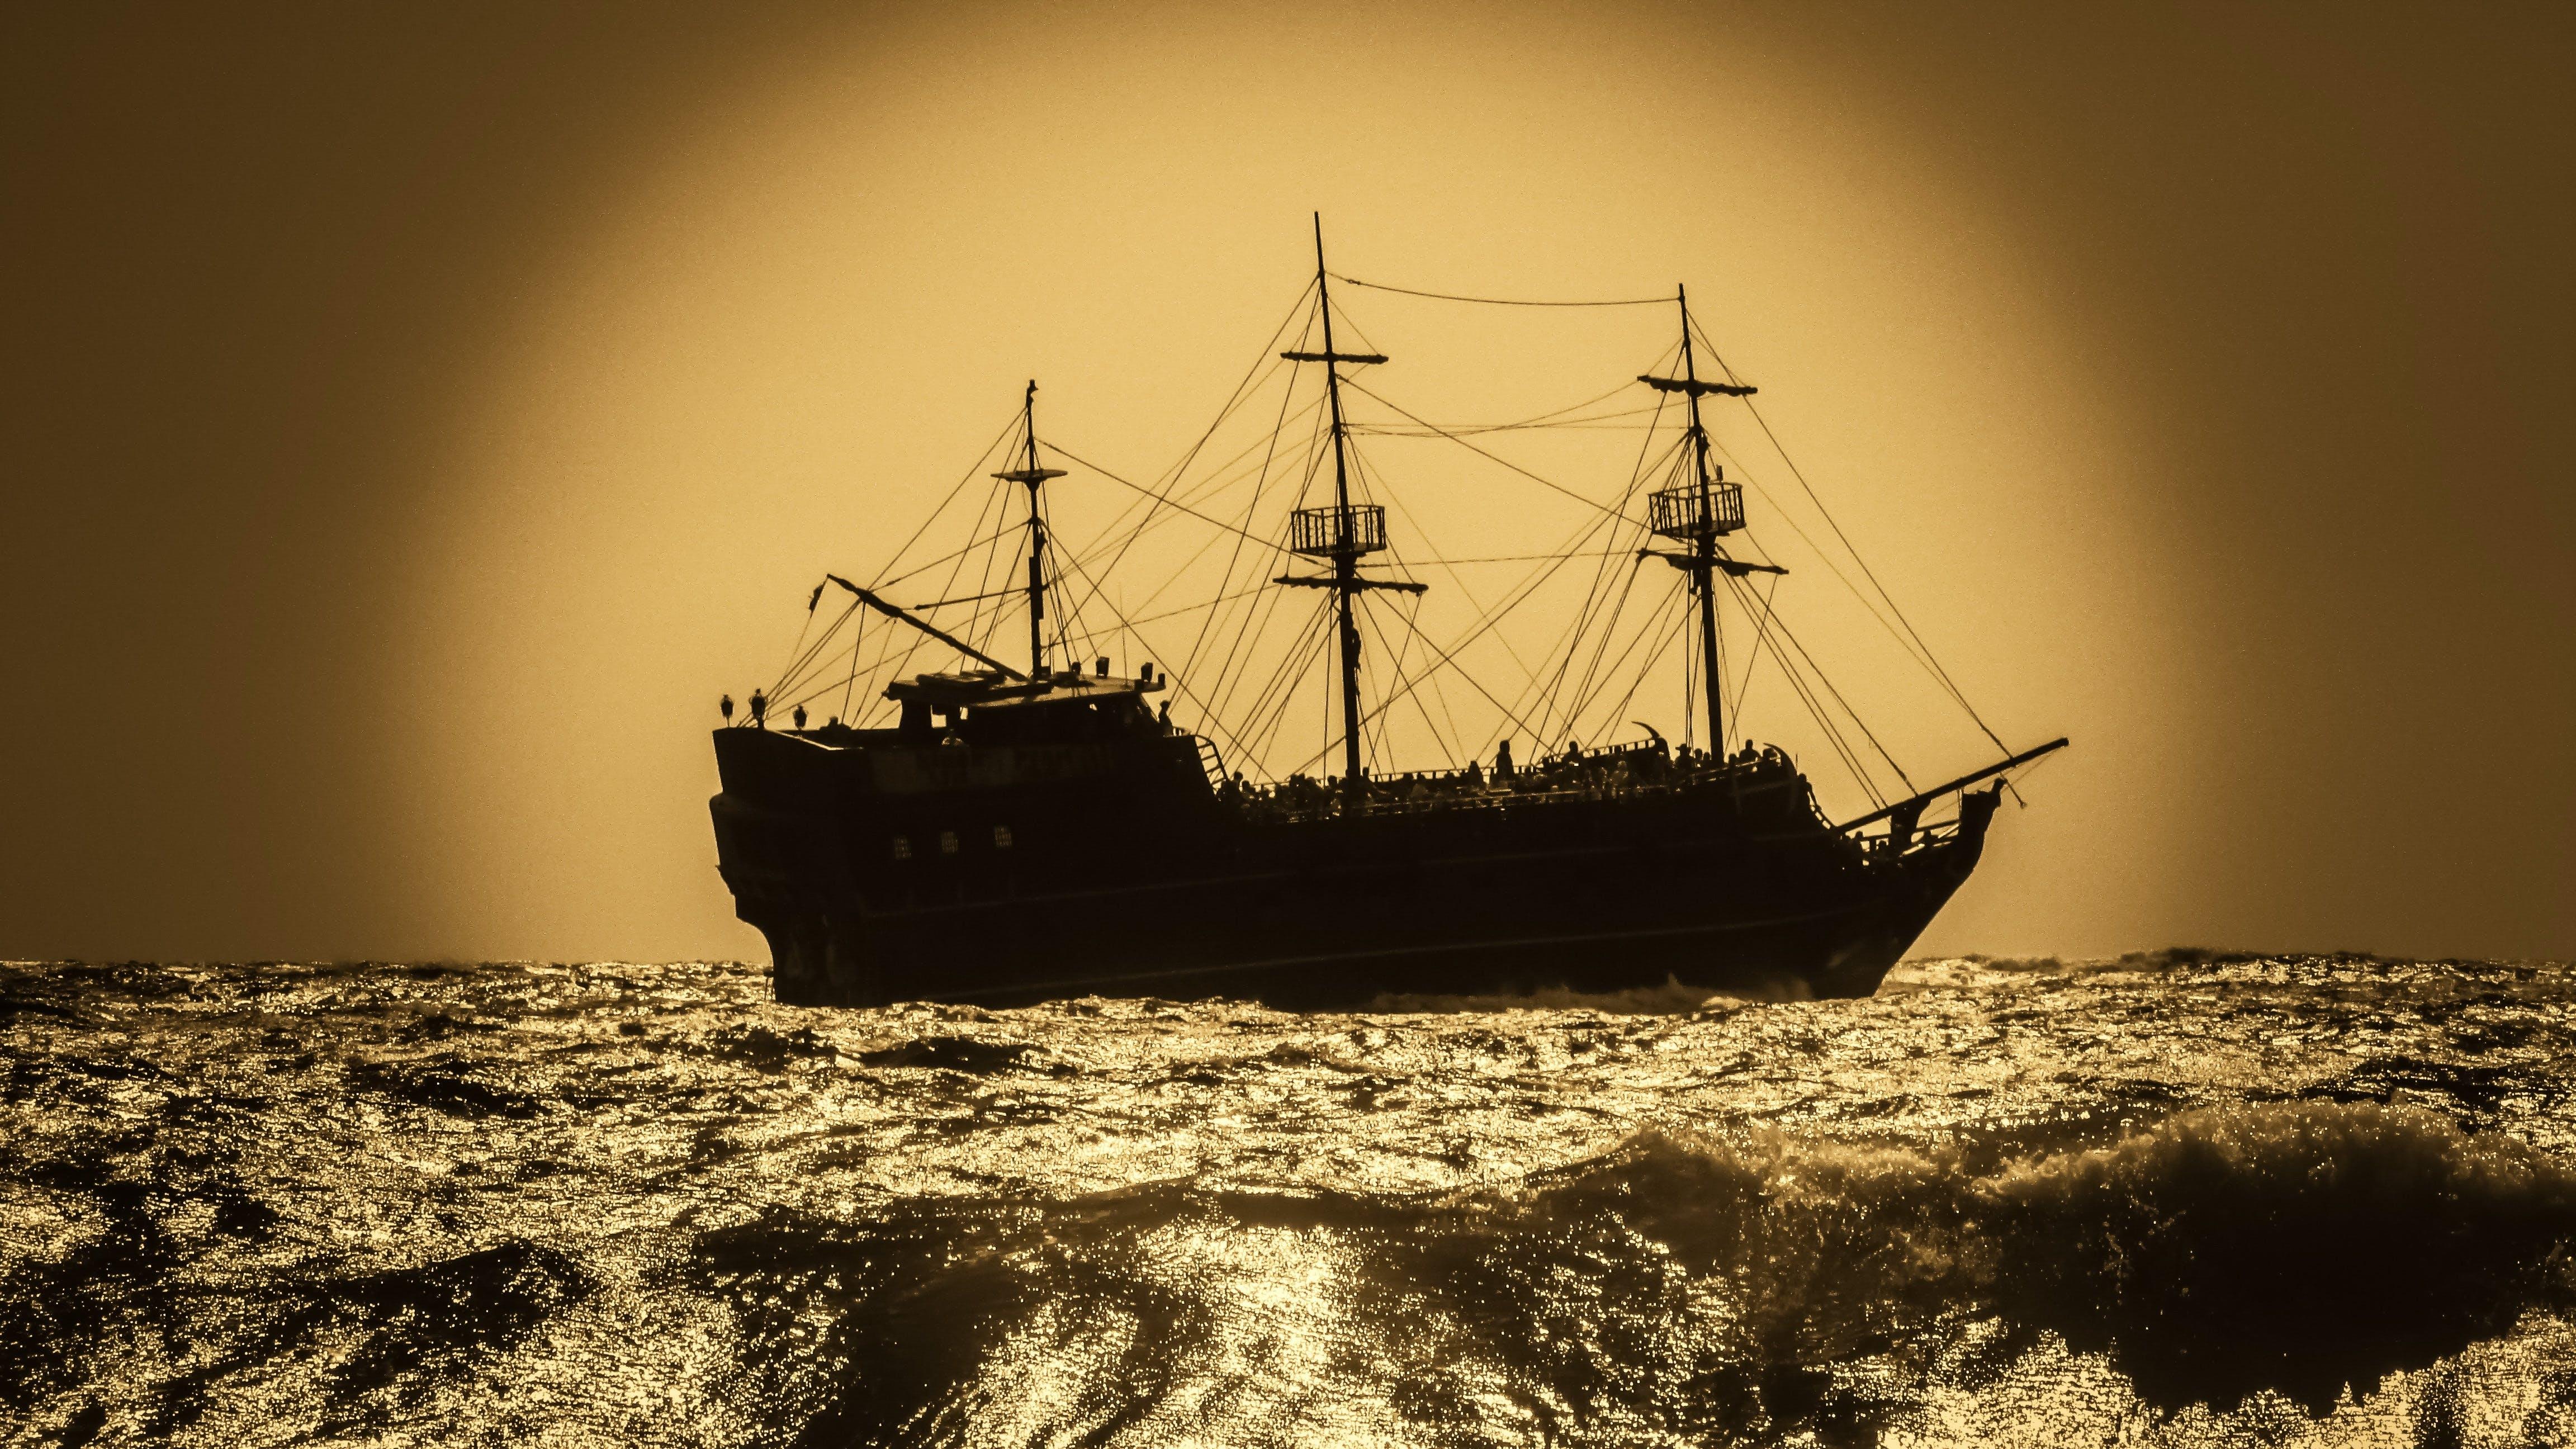 Free stock photo of sailboat, adventure, battleship, warship